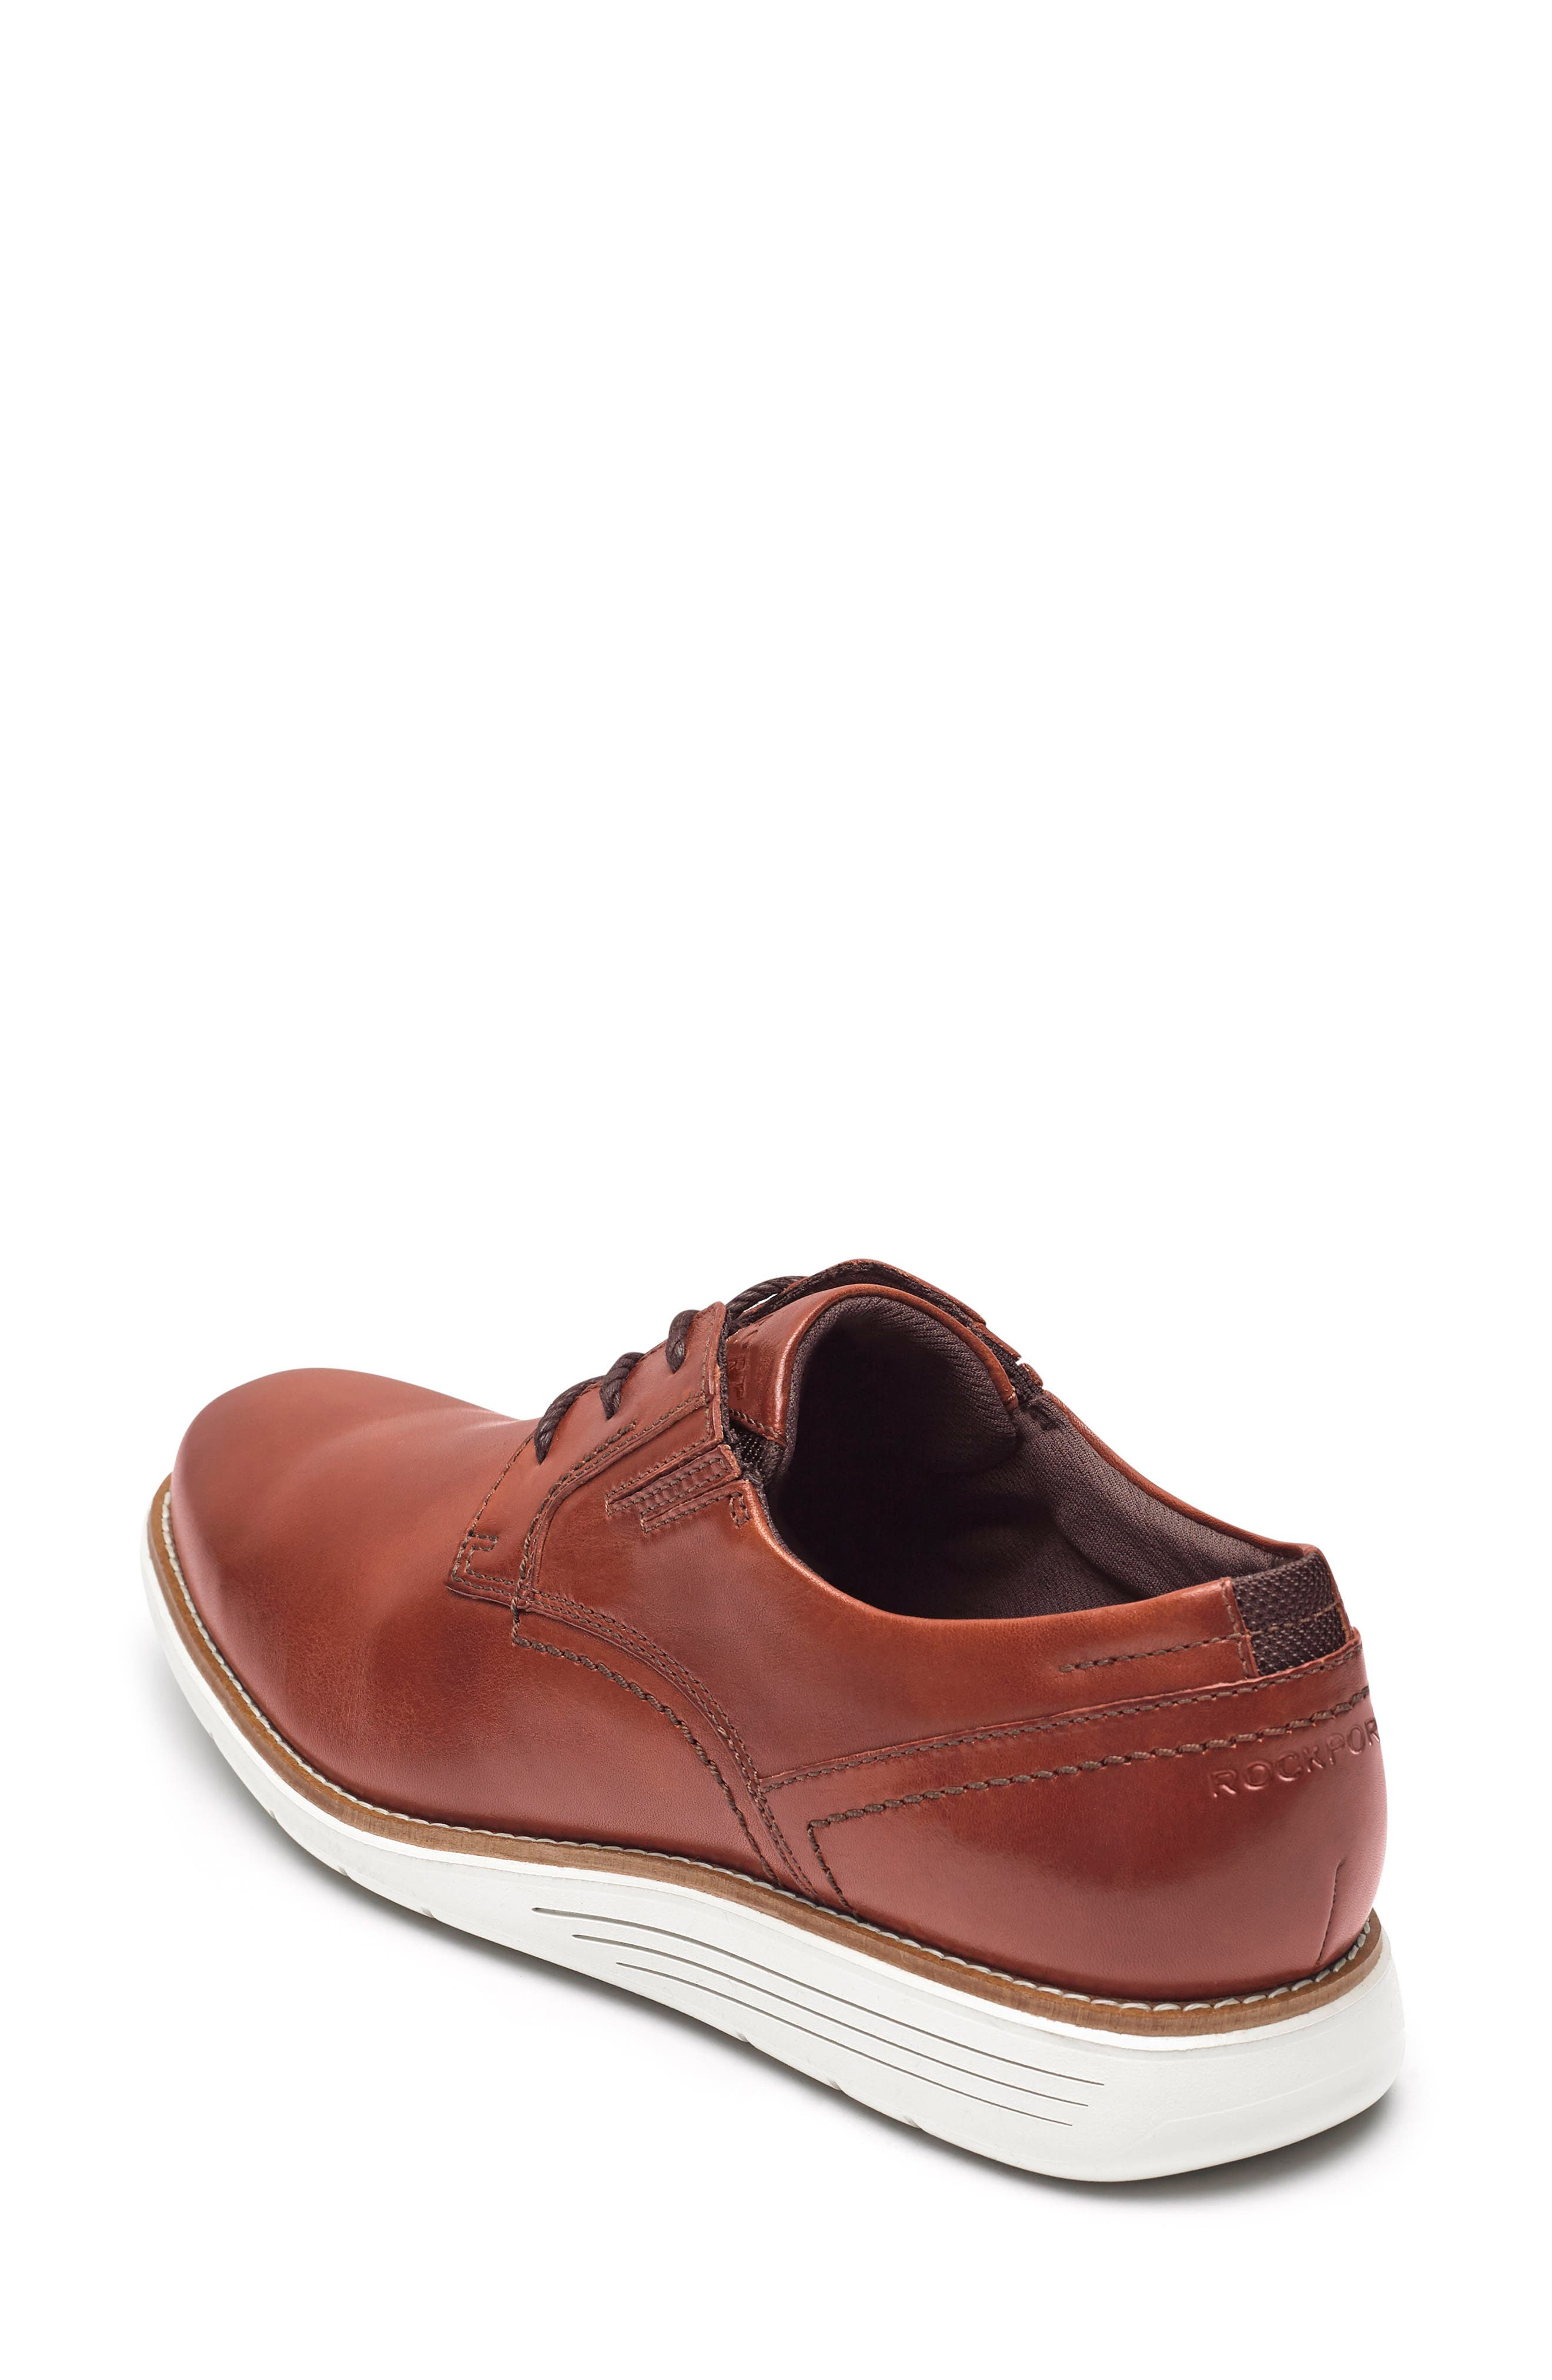 Total Motion Sport Plain Toe Derby,                             Alternate thumbnail 2, color,                             Tan Leather